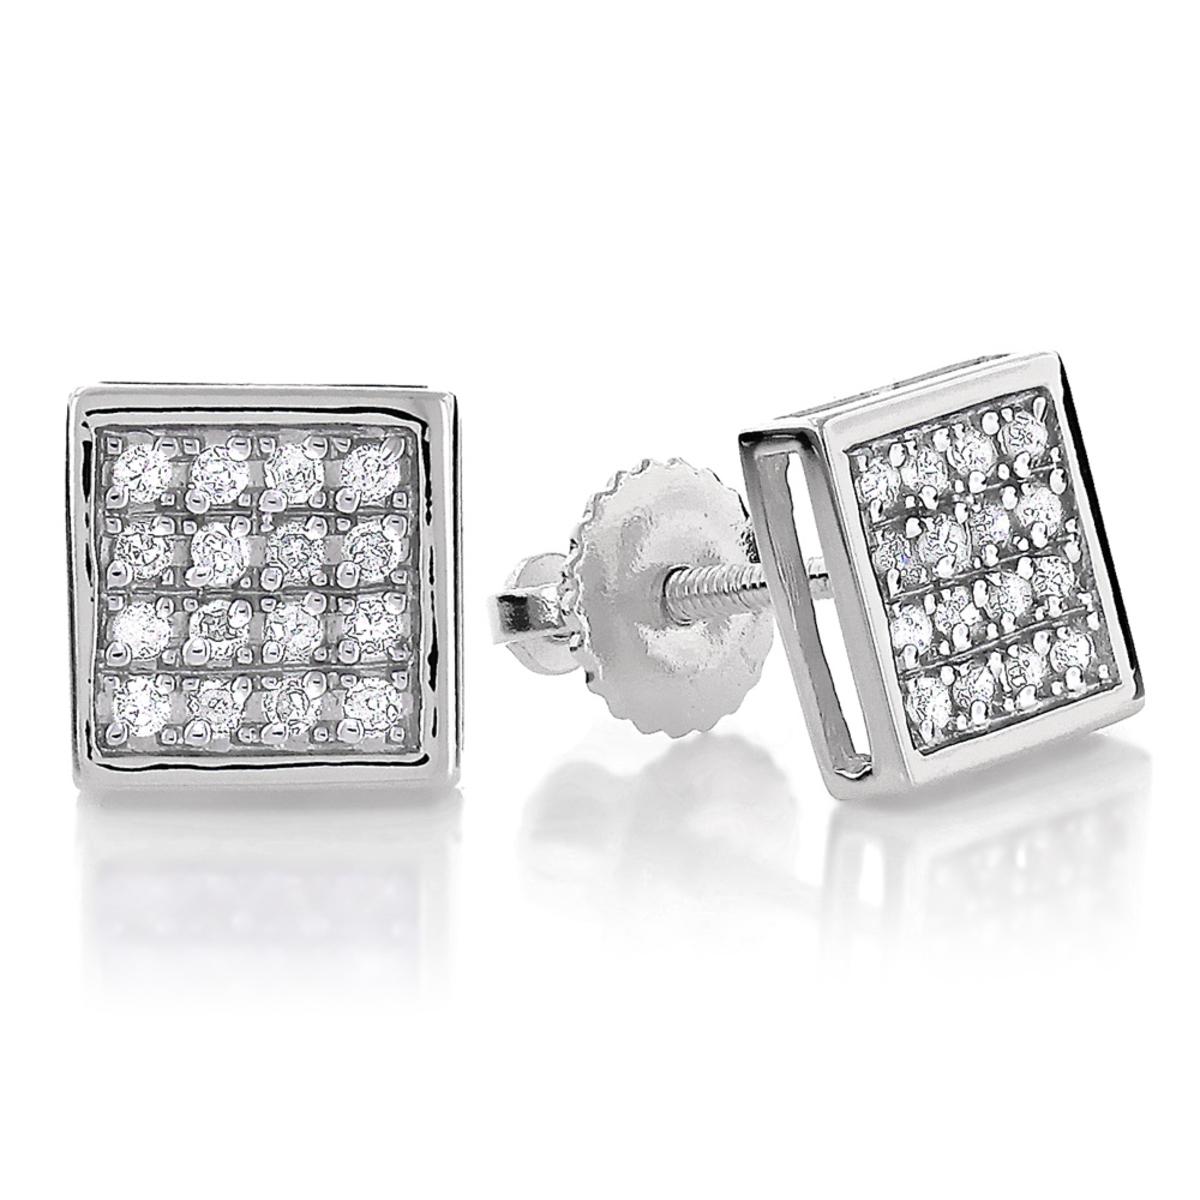 10K Gold Square Pave Diamond Stud Earrings 0.19ct